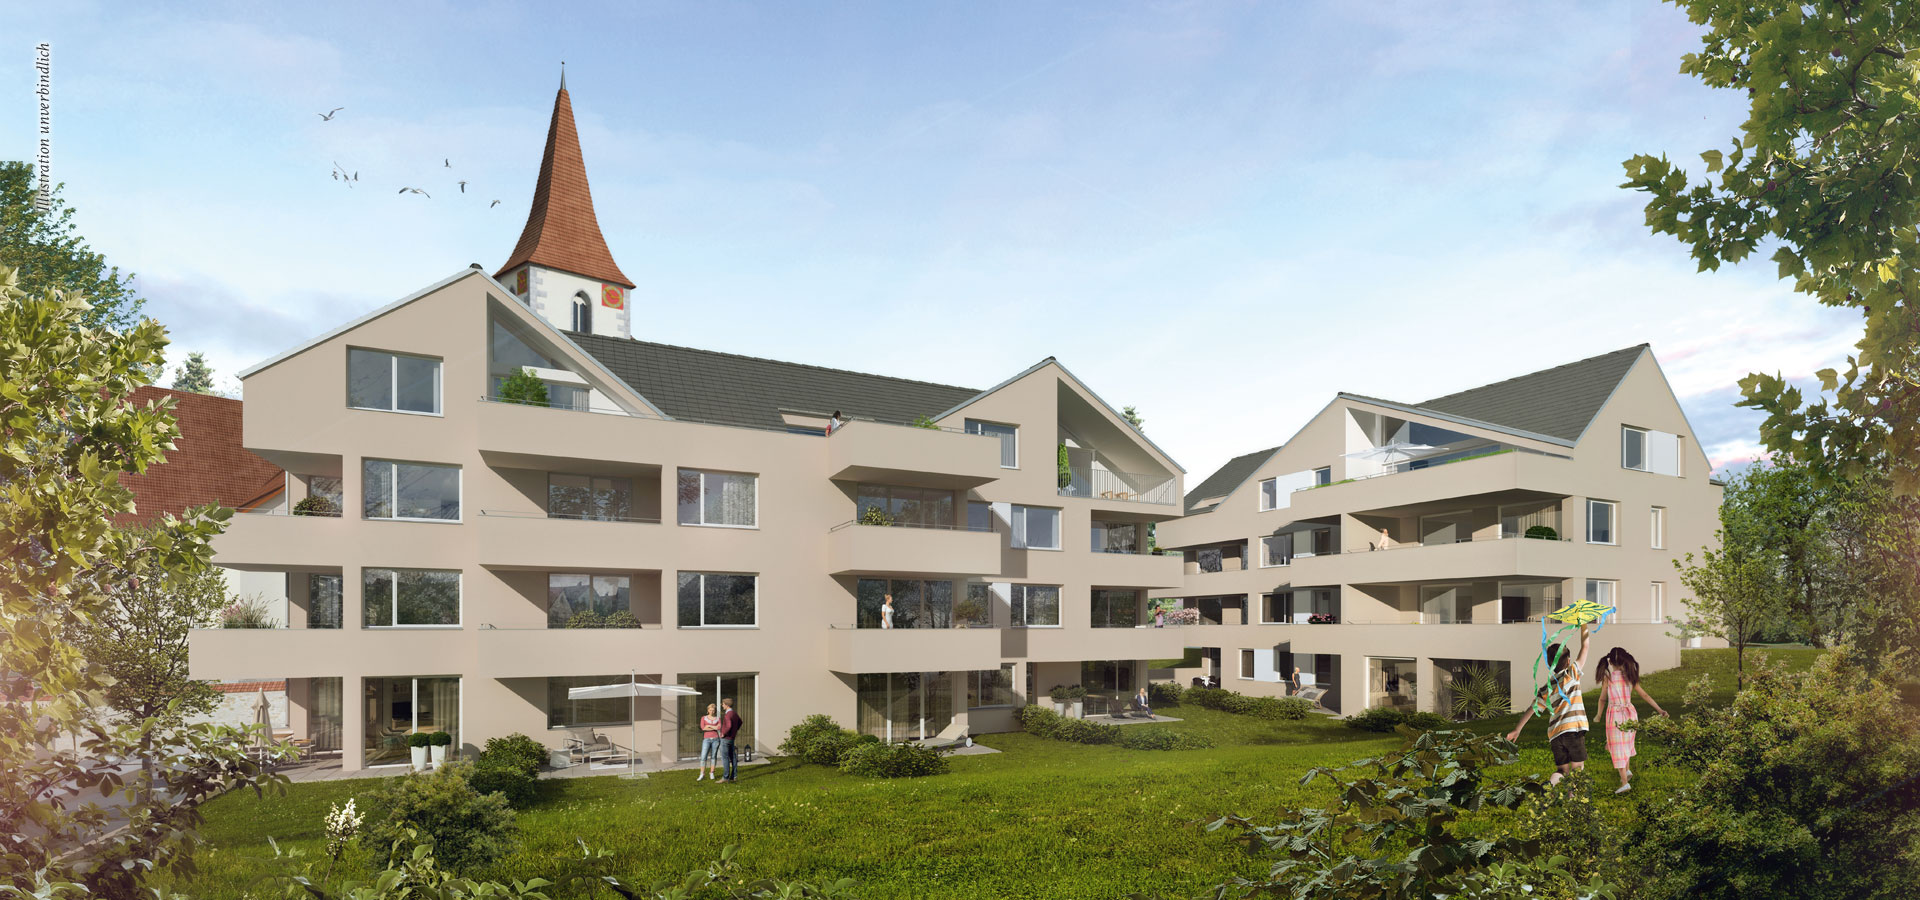 Wohnhaus Adler GmbH